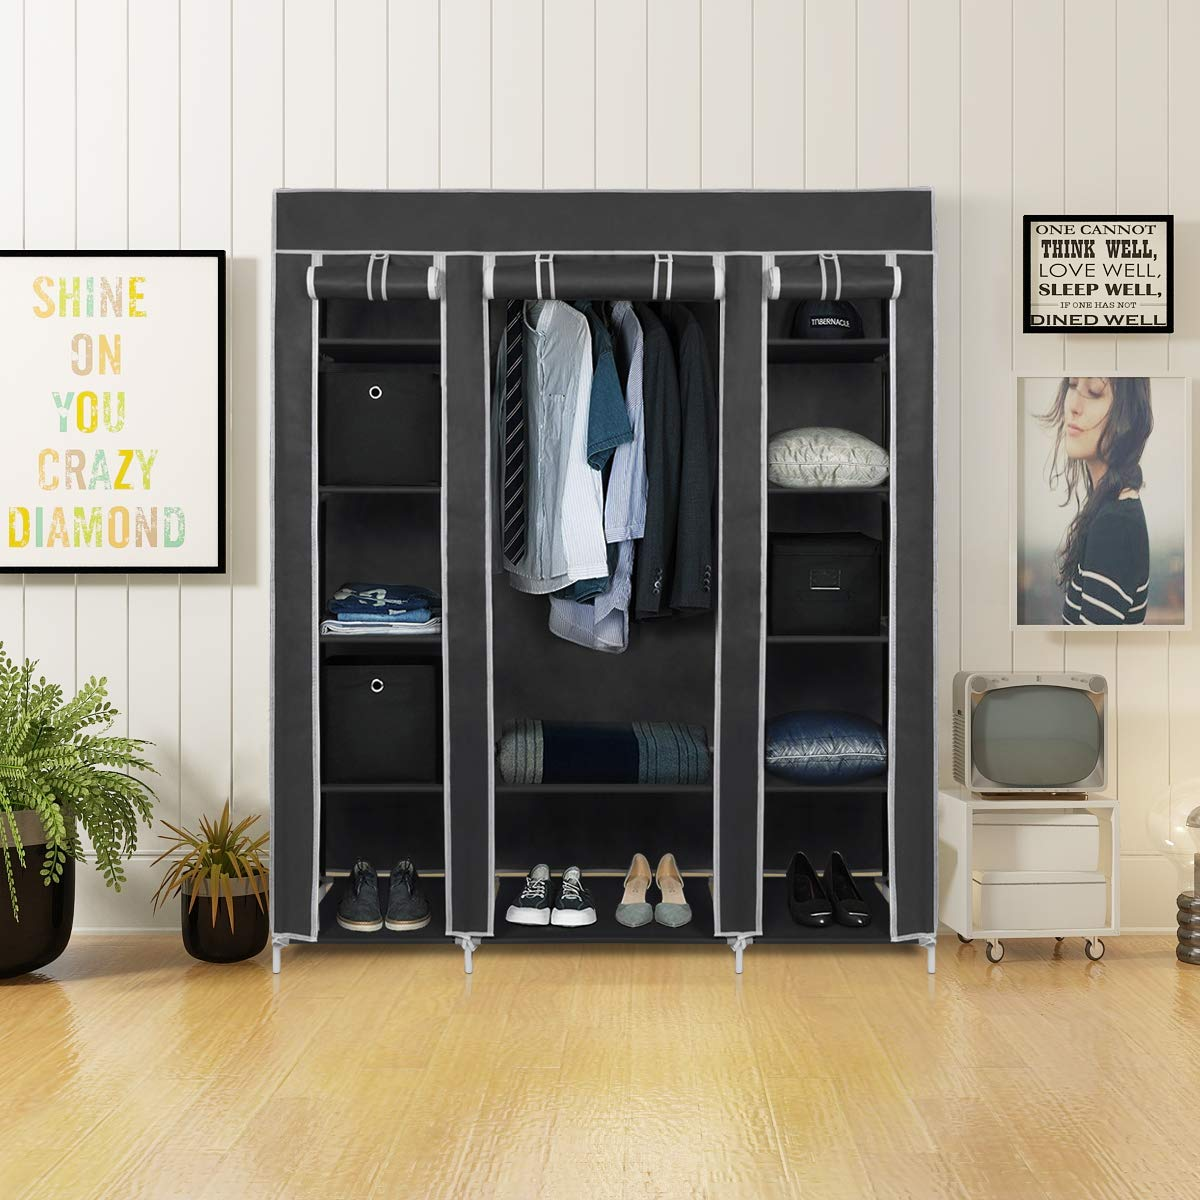 Grey LEMAIJIAJU Canvas Wardrobe Non-Woven Fabric Wardrobe Bedroom Furniture Storage Cupboard for Clothes Hanging Rail Storage Shelves